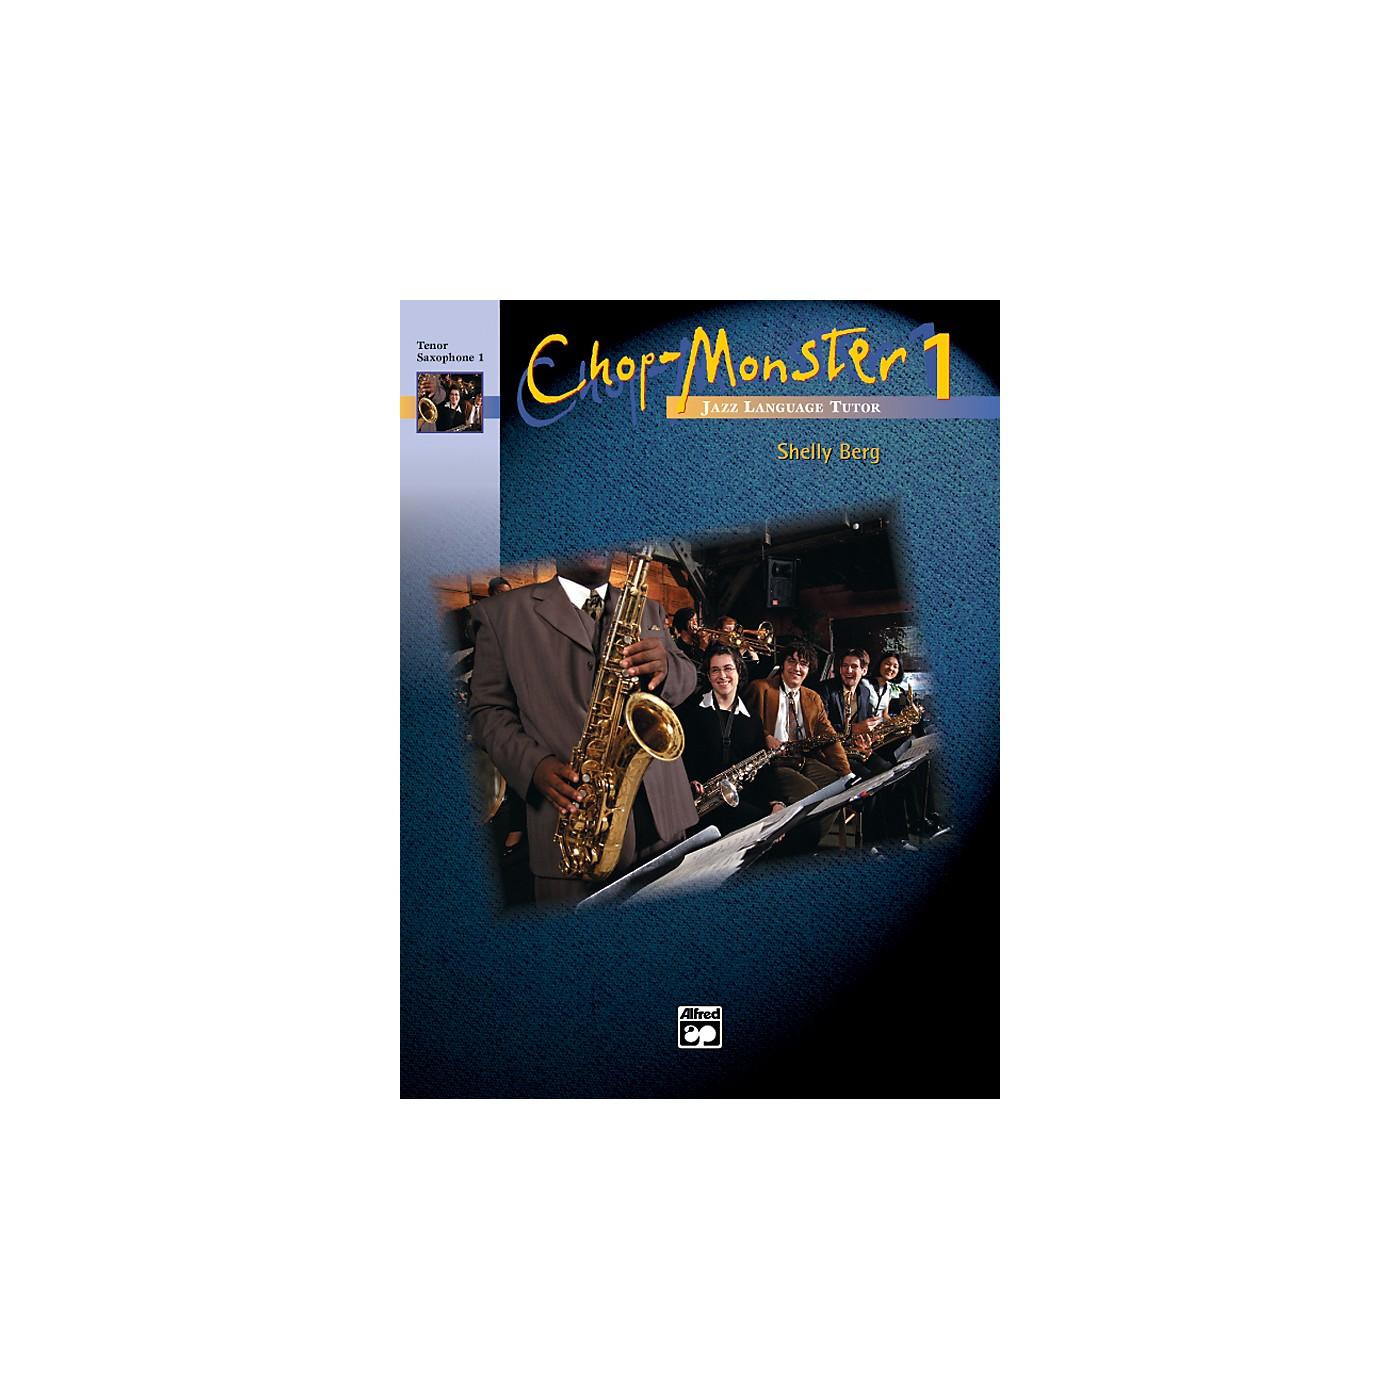 Alfred Chop-Monster Book 1 Baritone Saxophone Book thumbnail